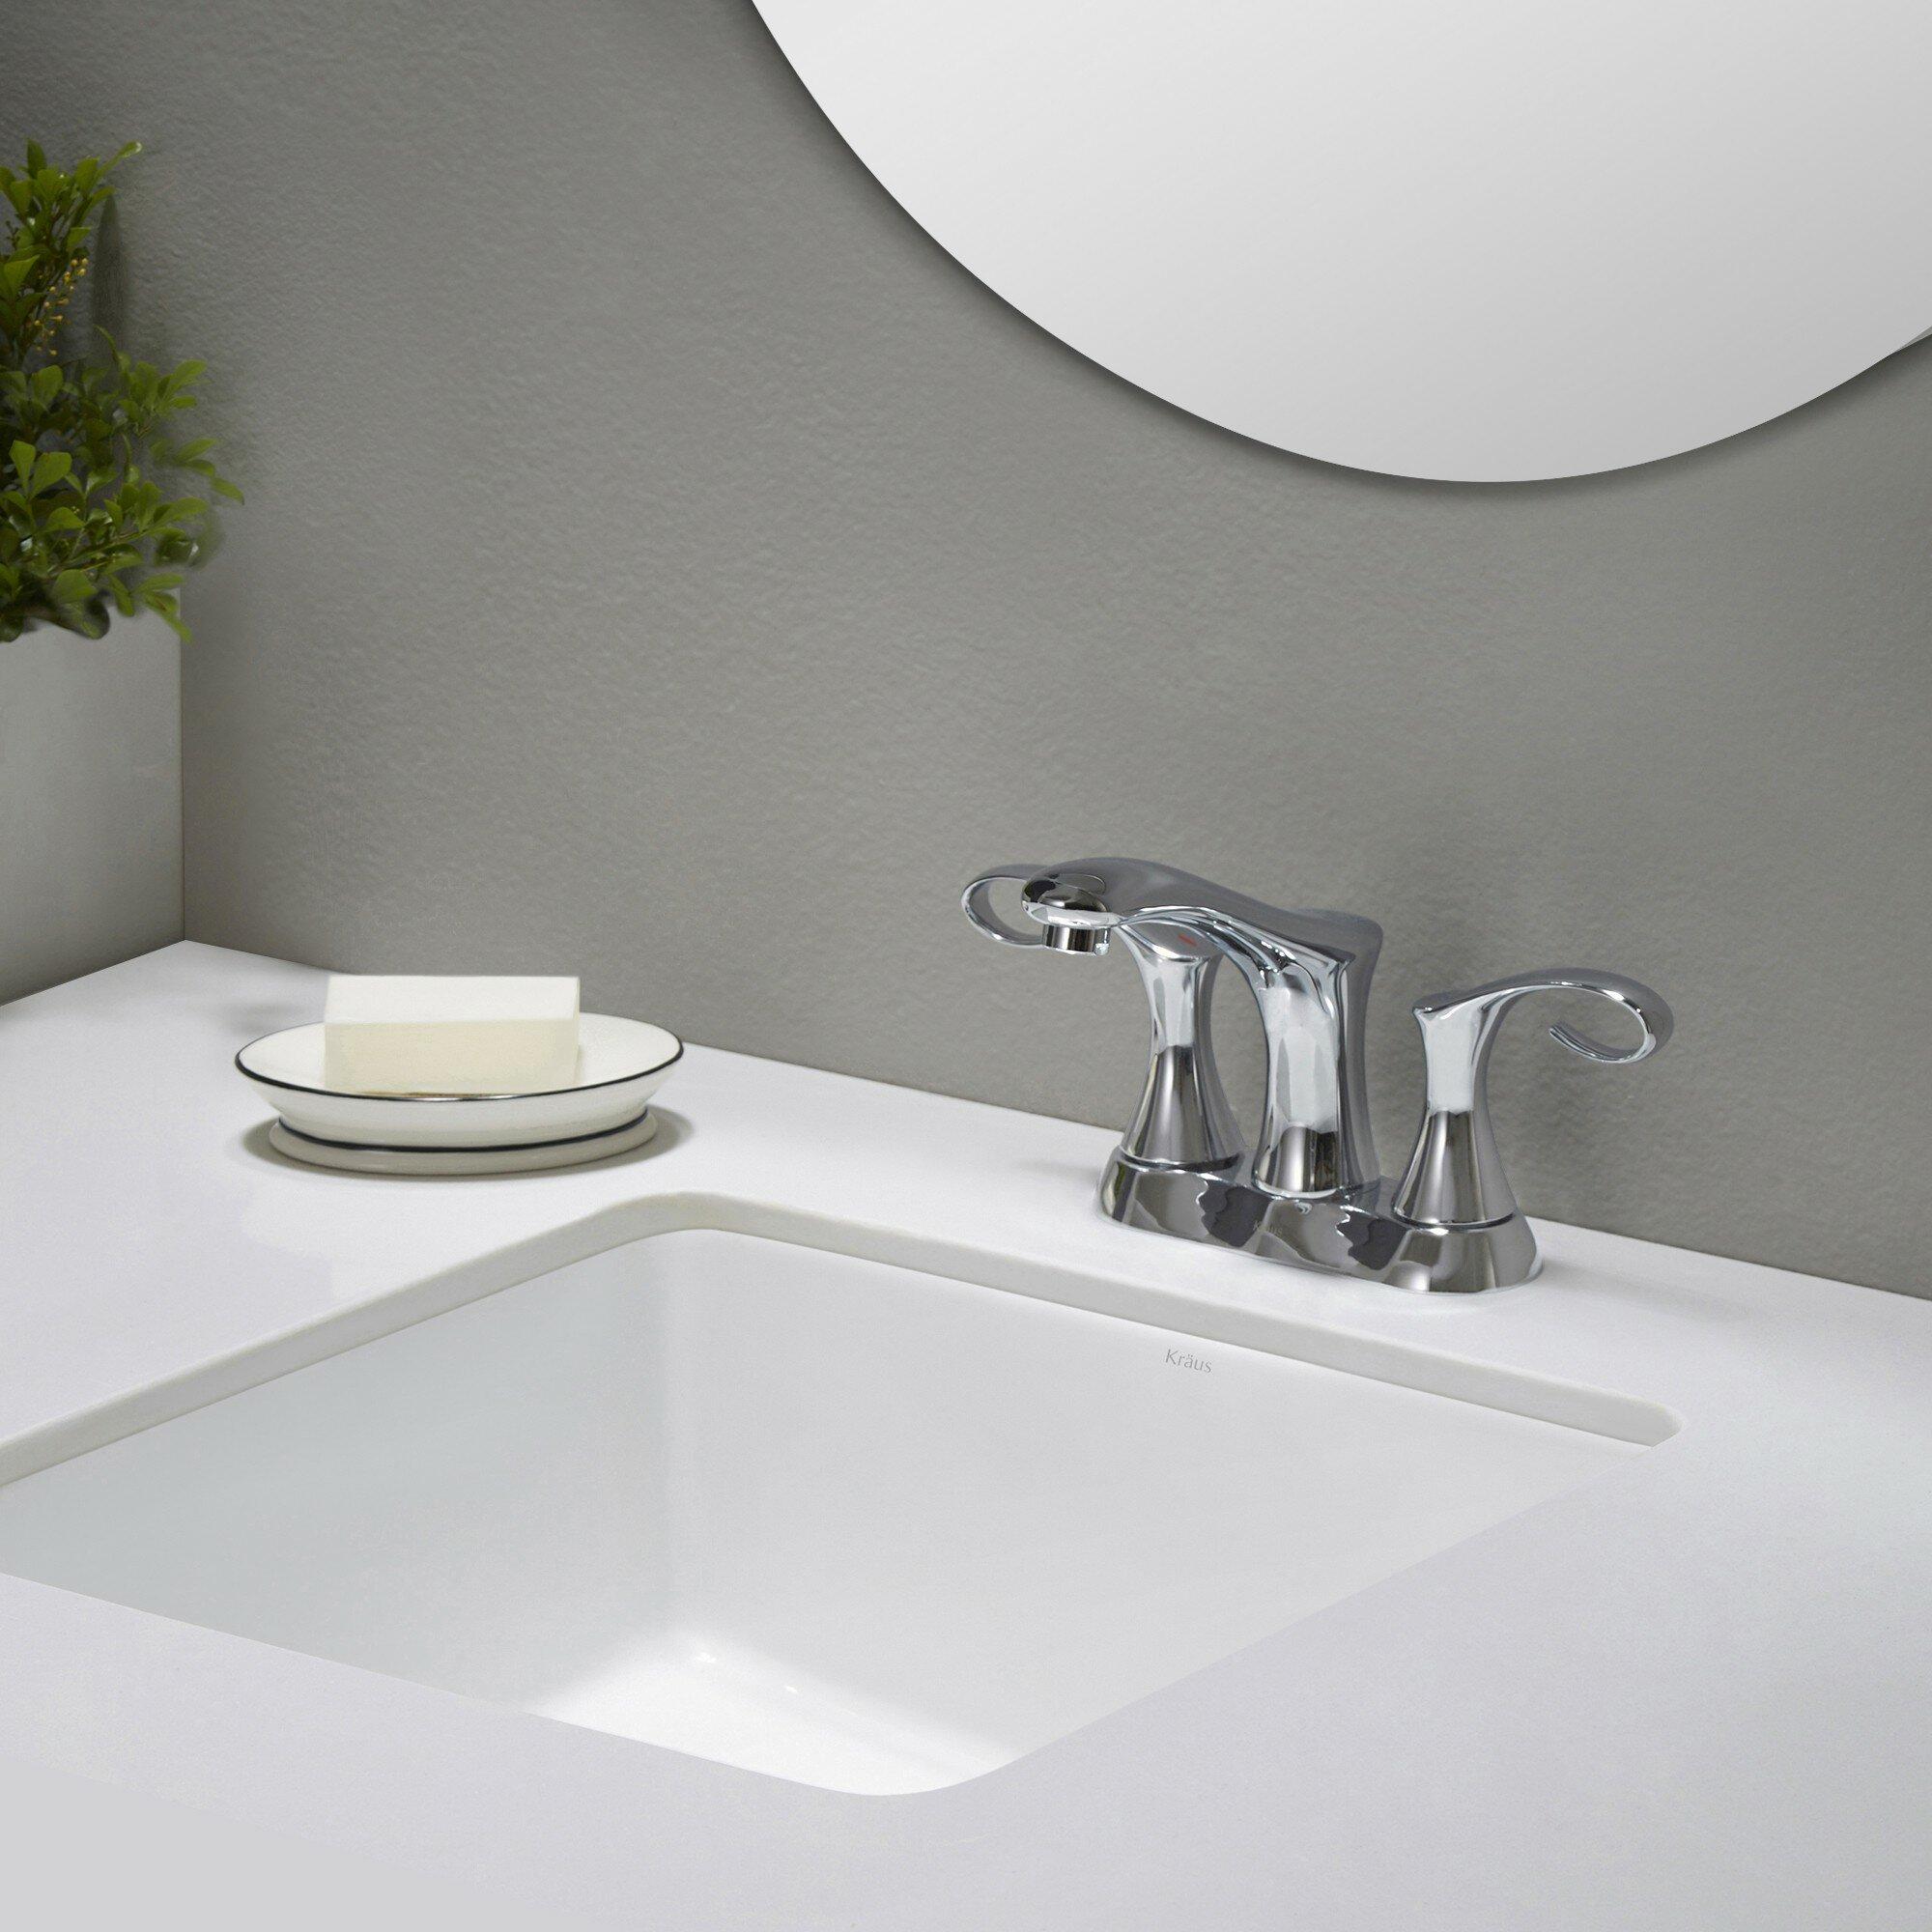 Elavo Ceramic Square Undermount Bathroom Sink With Overflow Wayfair